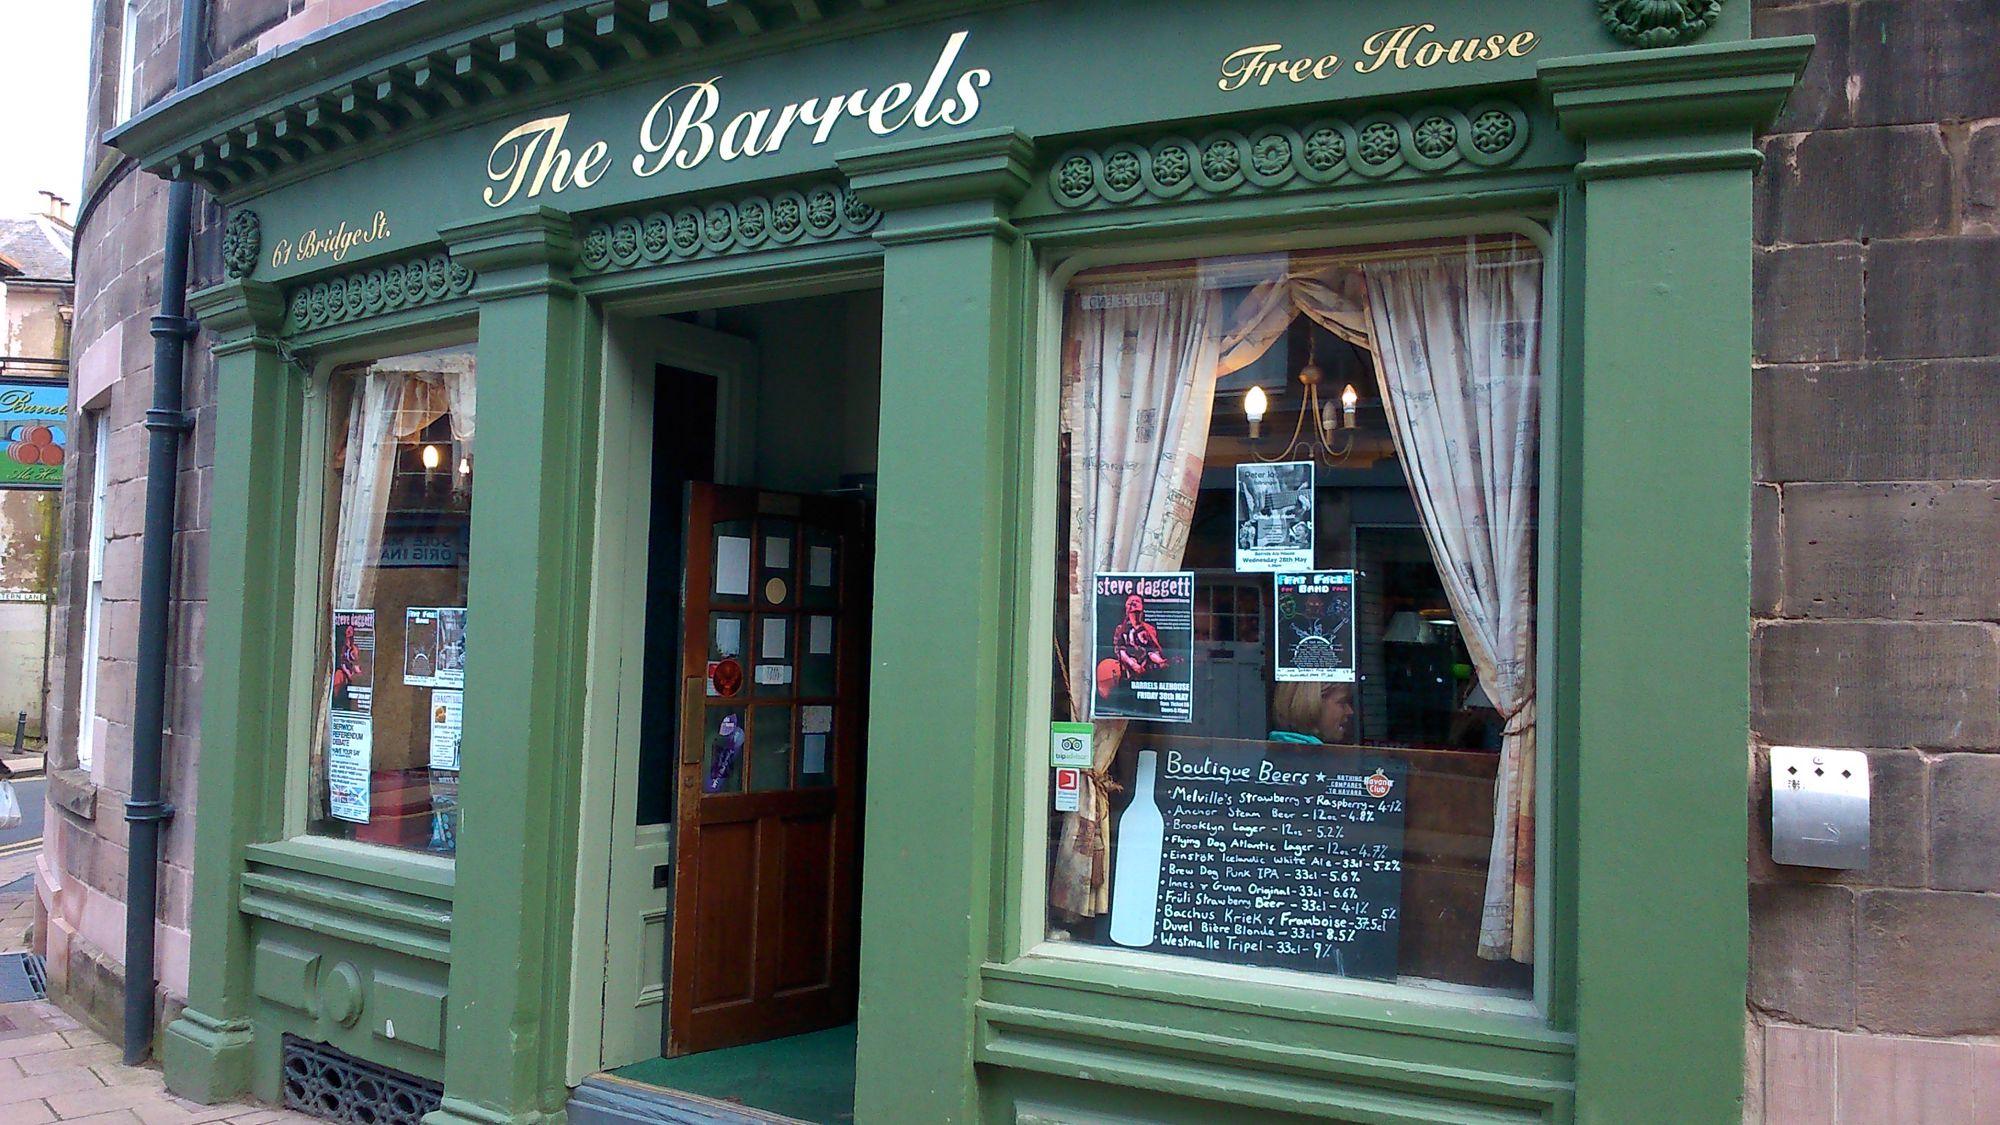 The Barrels Alehouse